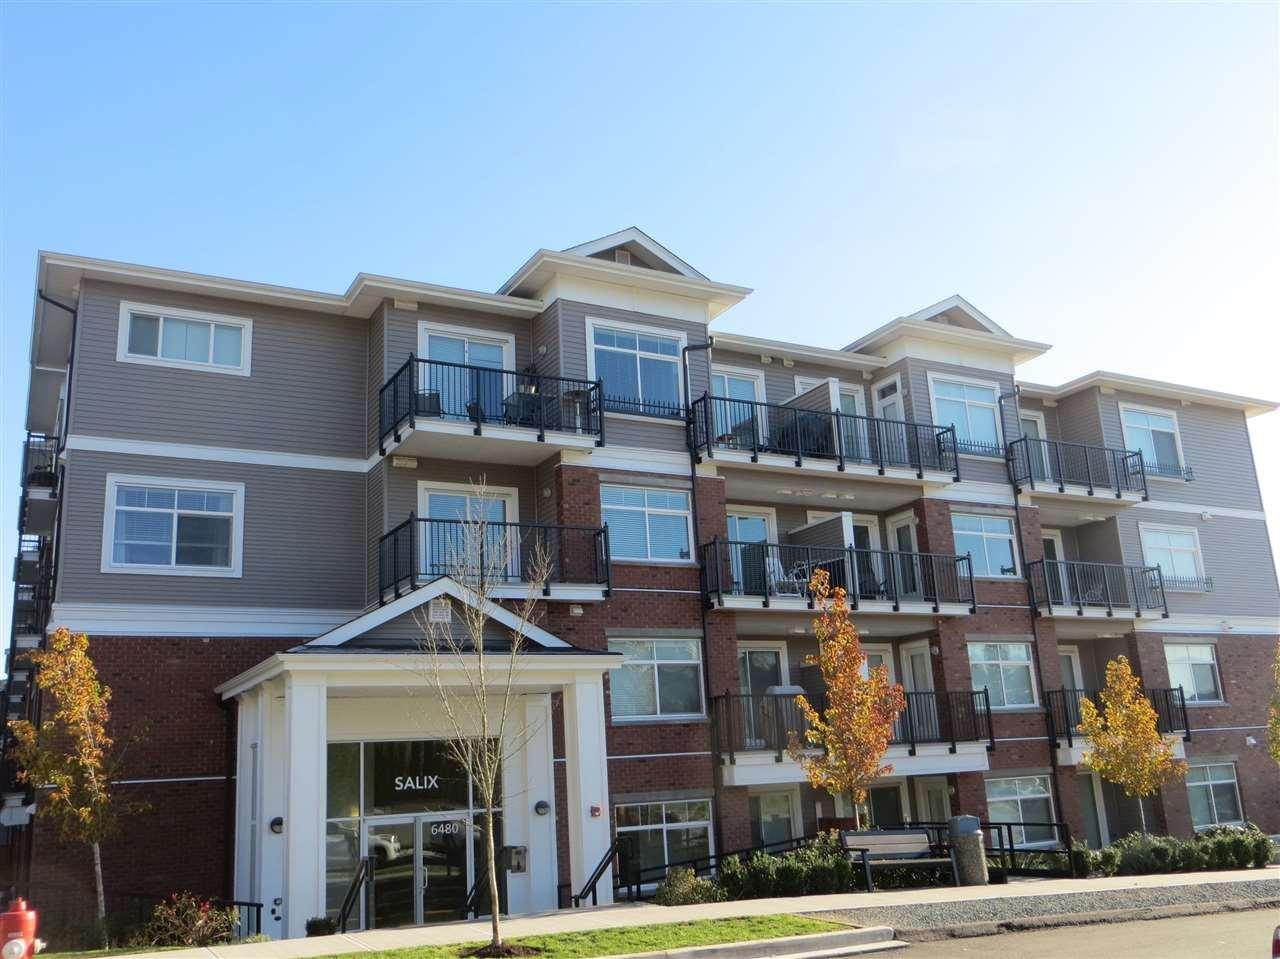 R2075996 - 101 6480 195A STREET, Clayton, Surrey, BC - Apartment Unit